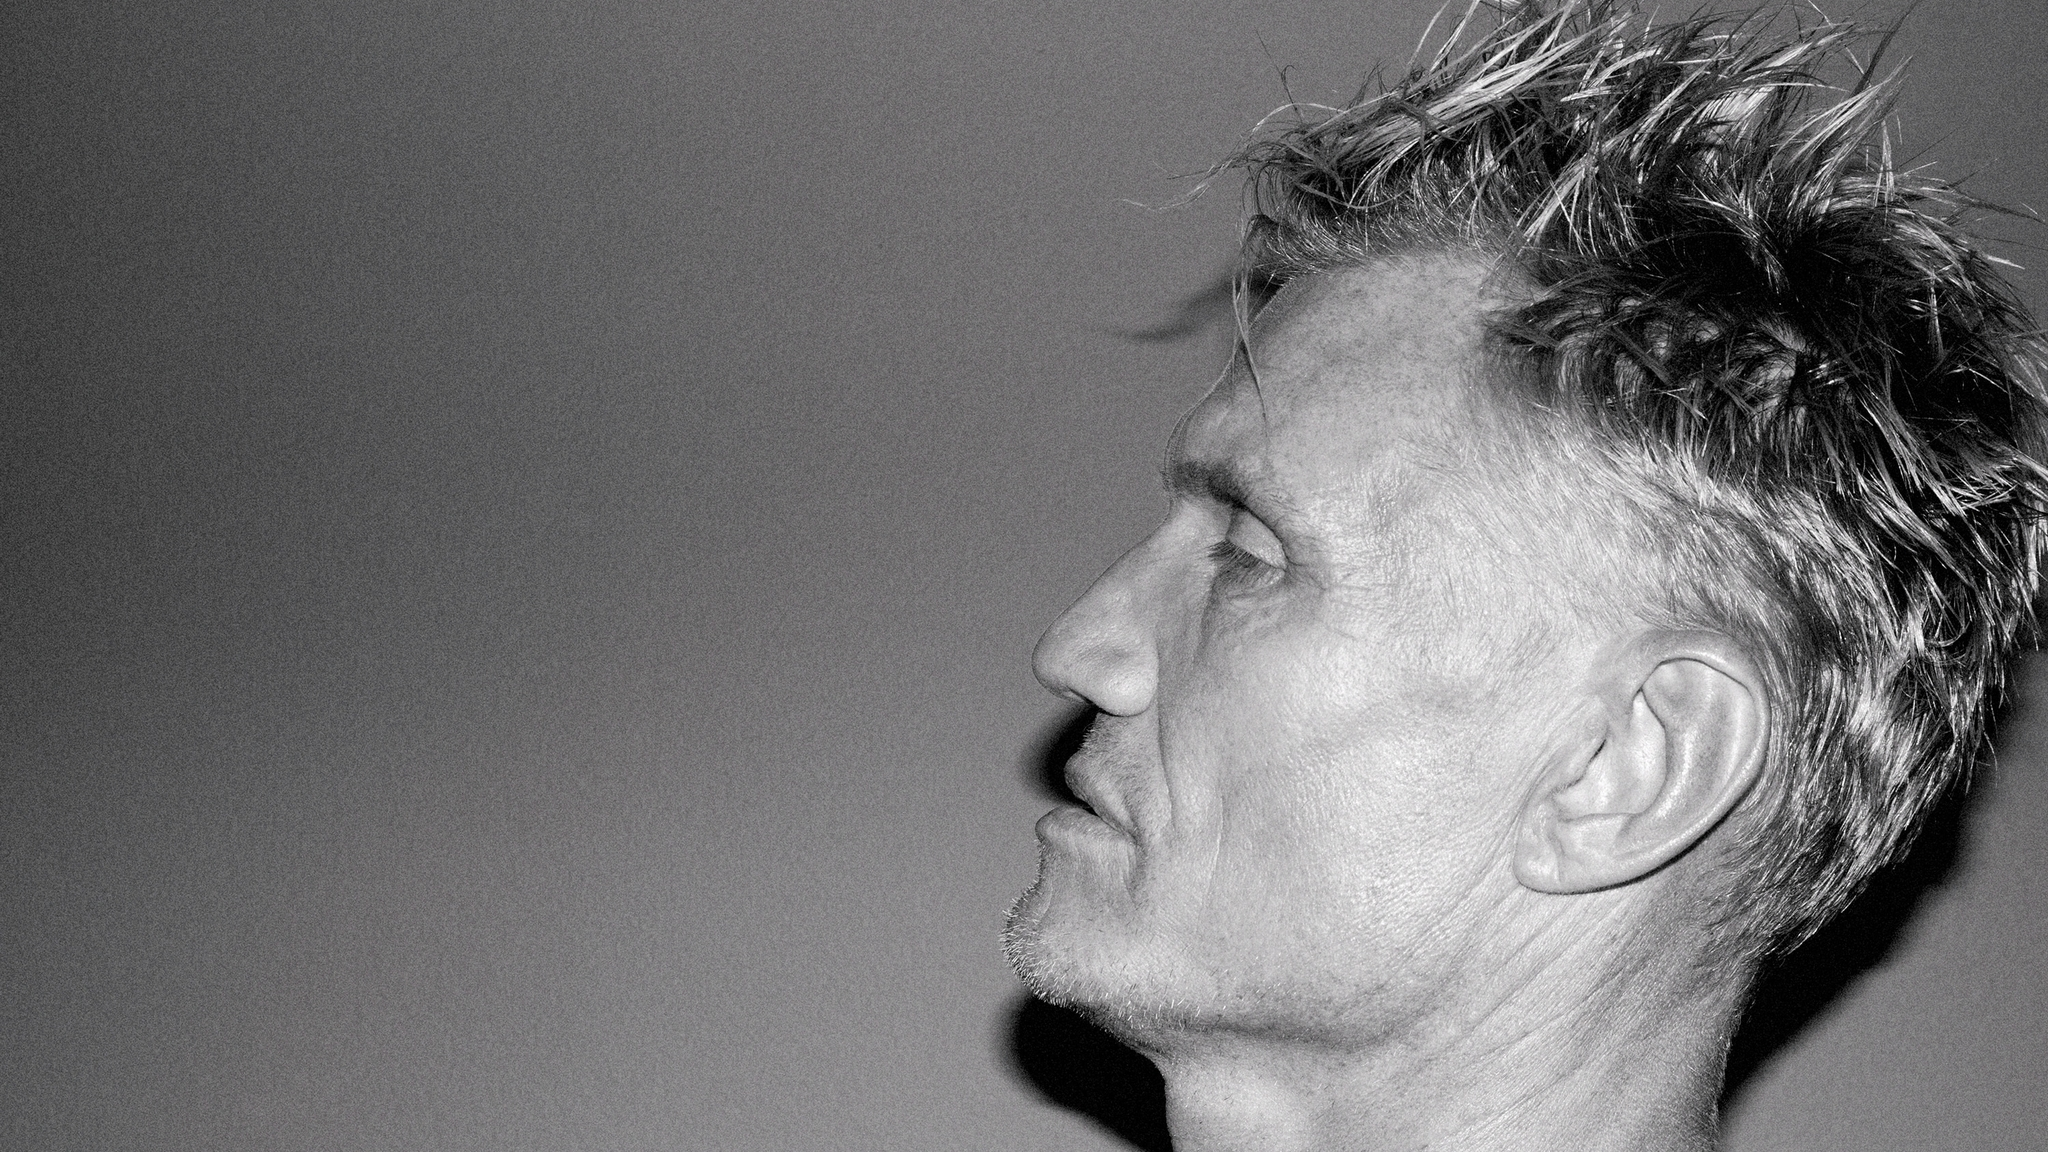 2048x1152 Dolph Lundgren Face Profile 2048x1152 Resolution